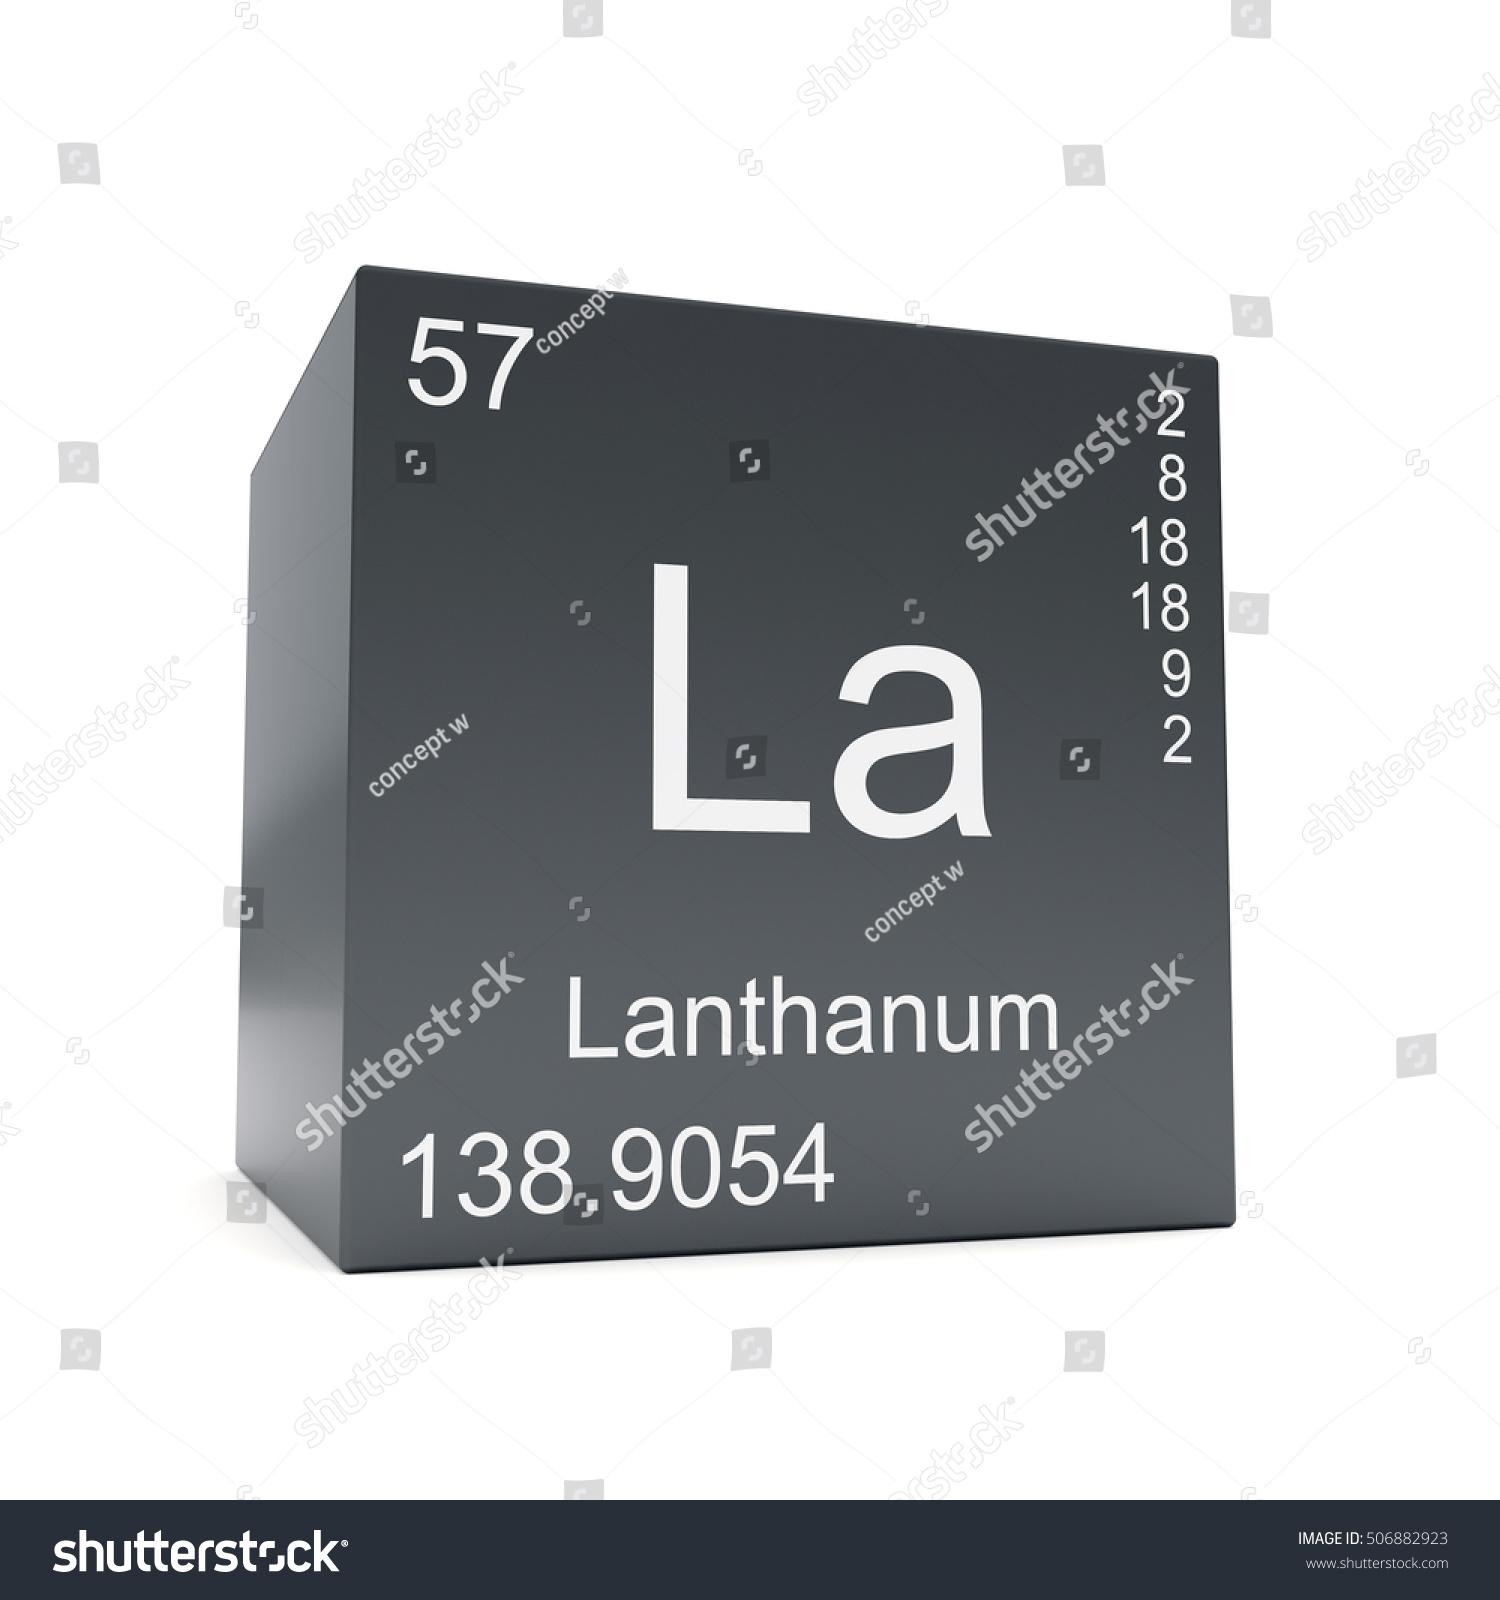 Lanthanum chemical element symbol periodic table stock lanthanum chemical element symbol from the periodic table displayed on black cube 3d render gamestrikefo Gallery